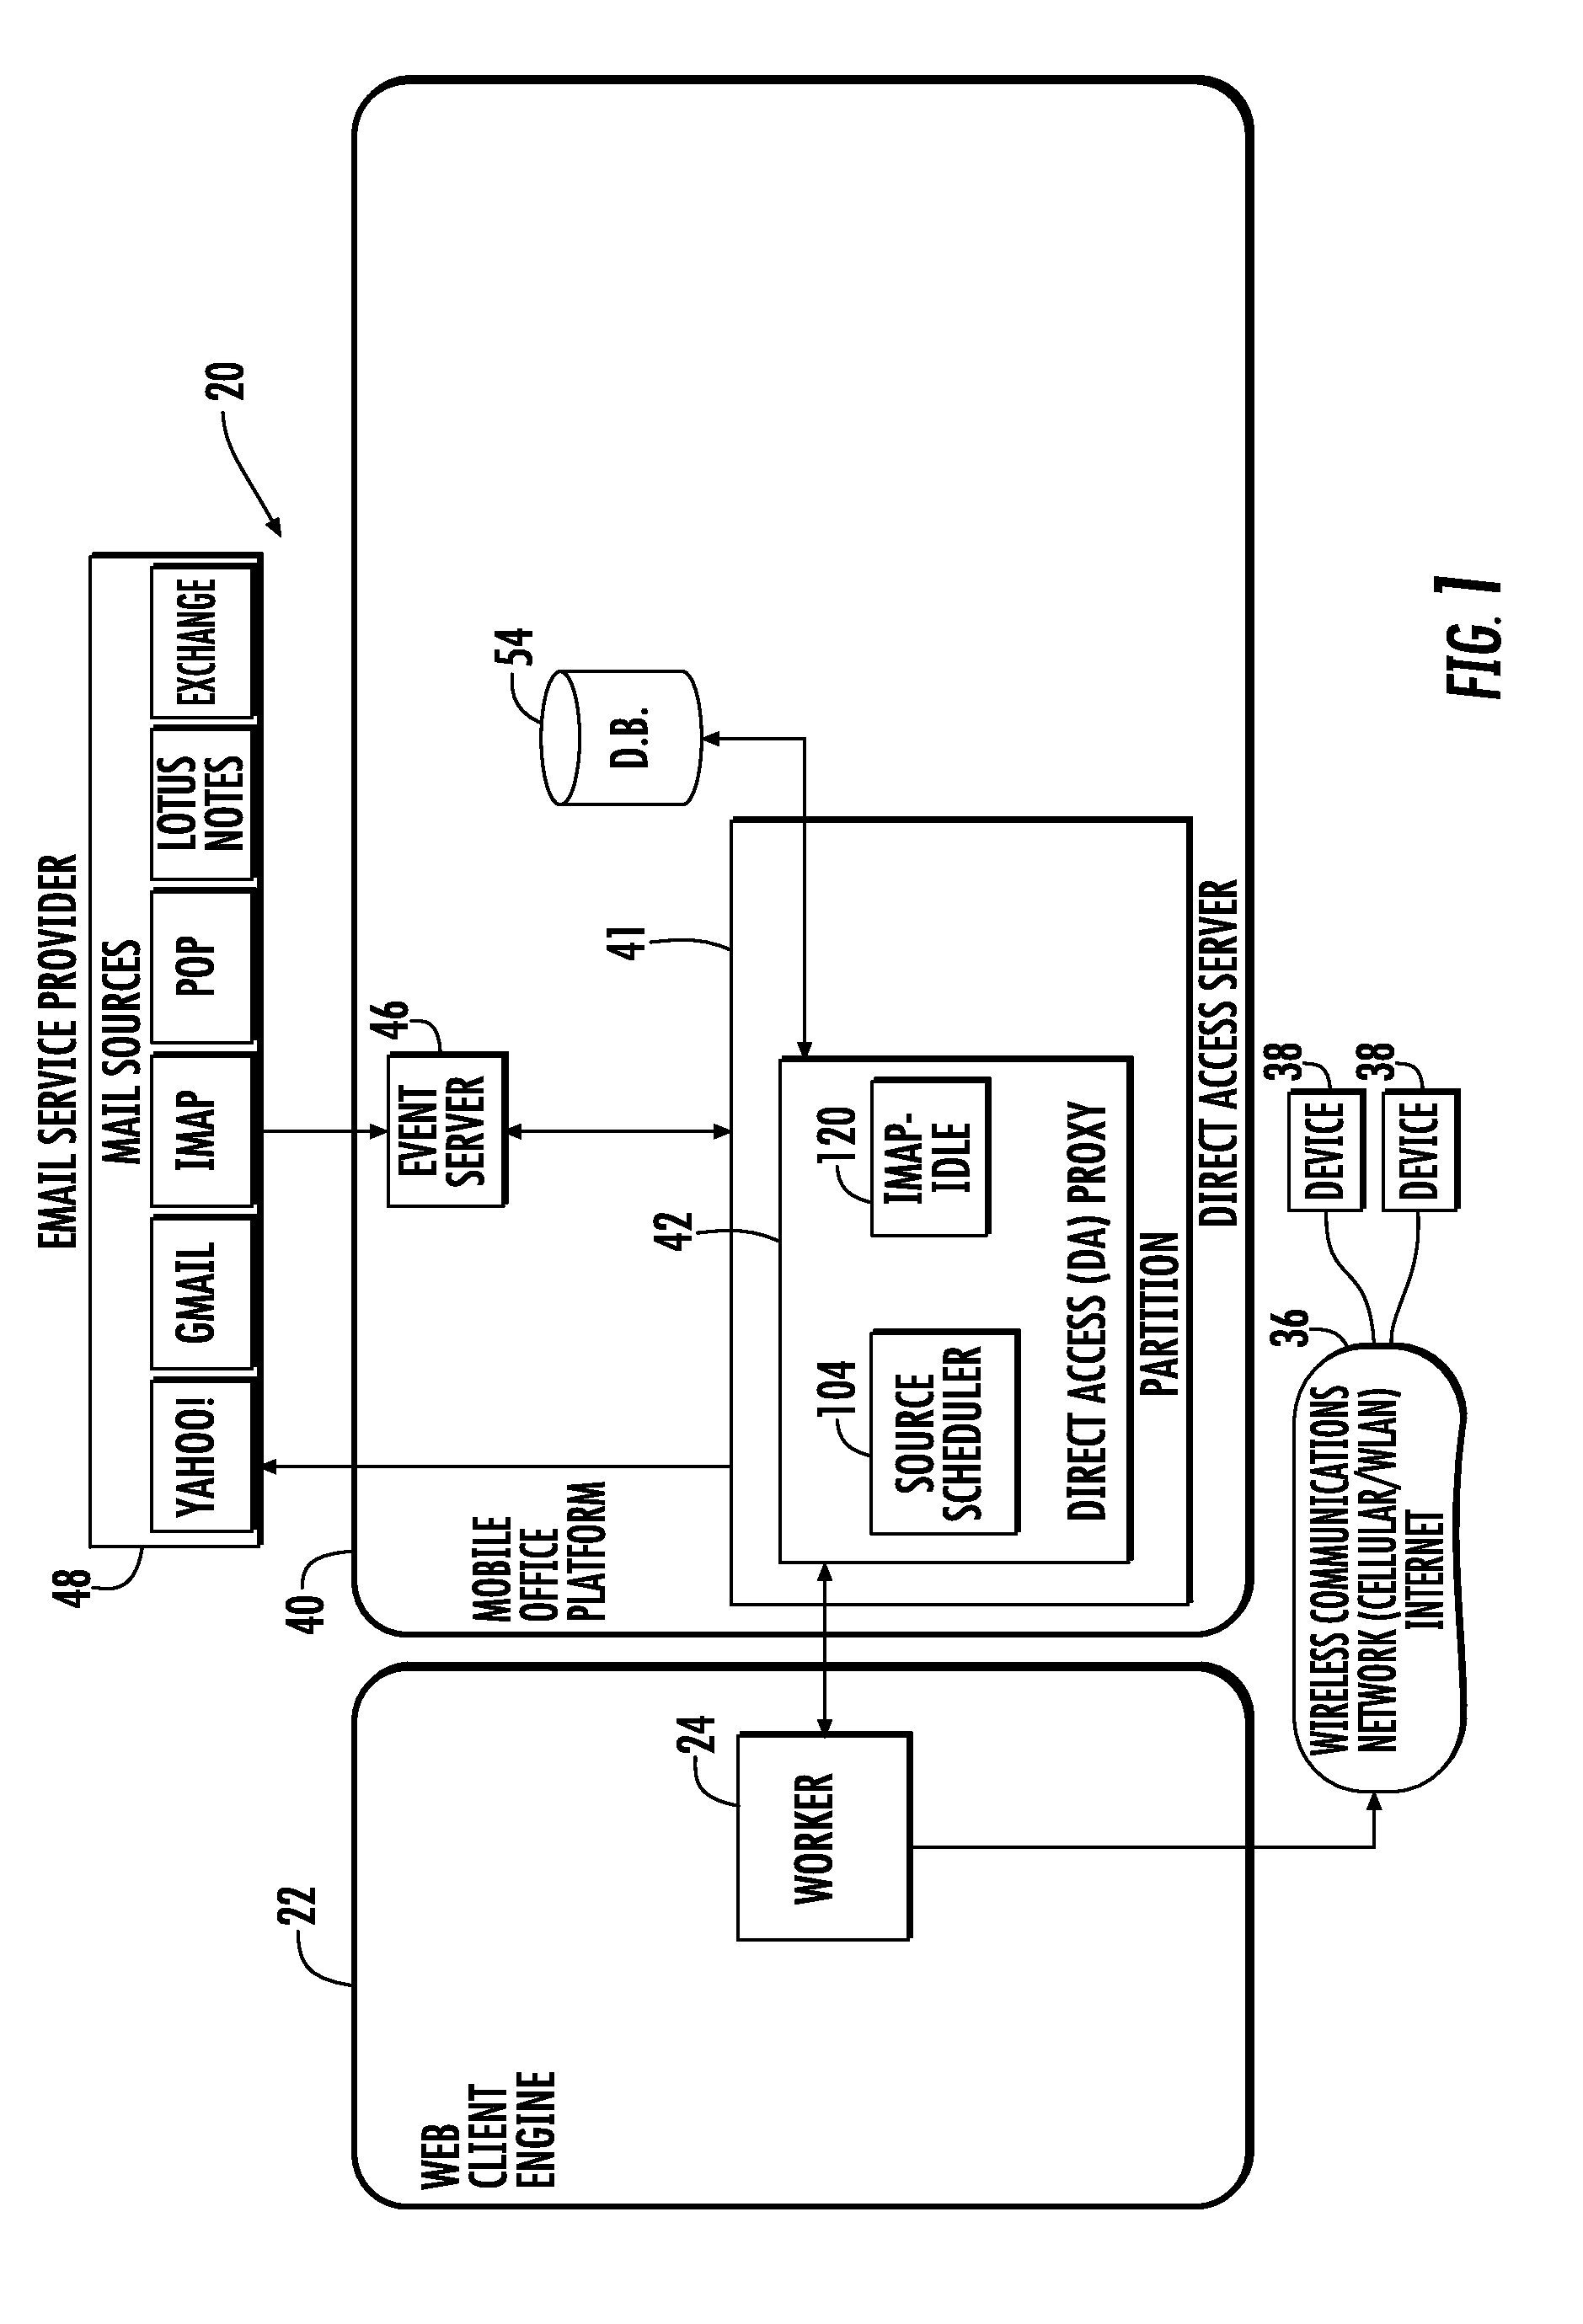 Patent US 20100250681A1